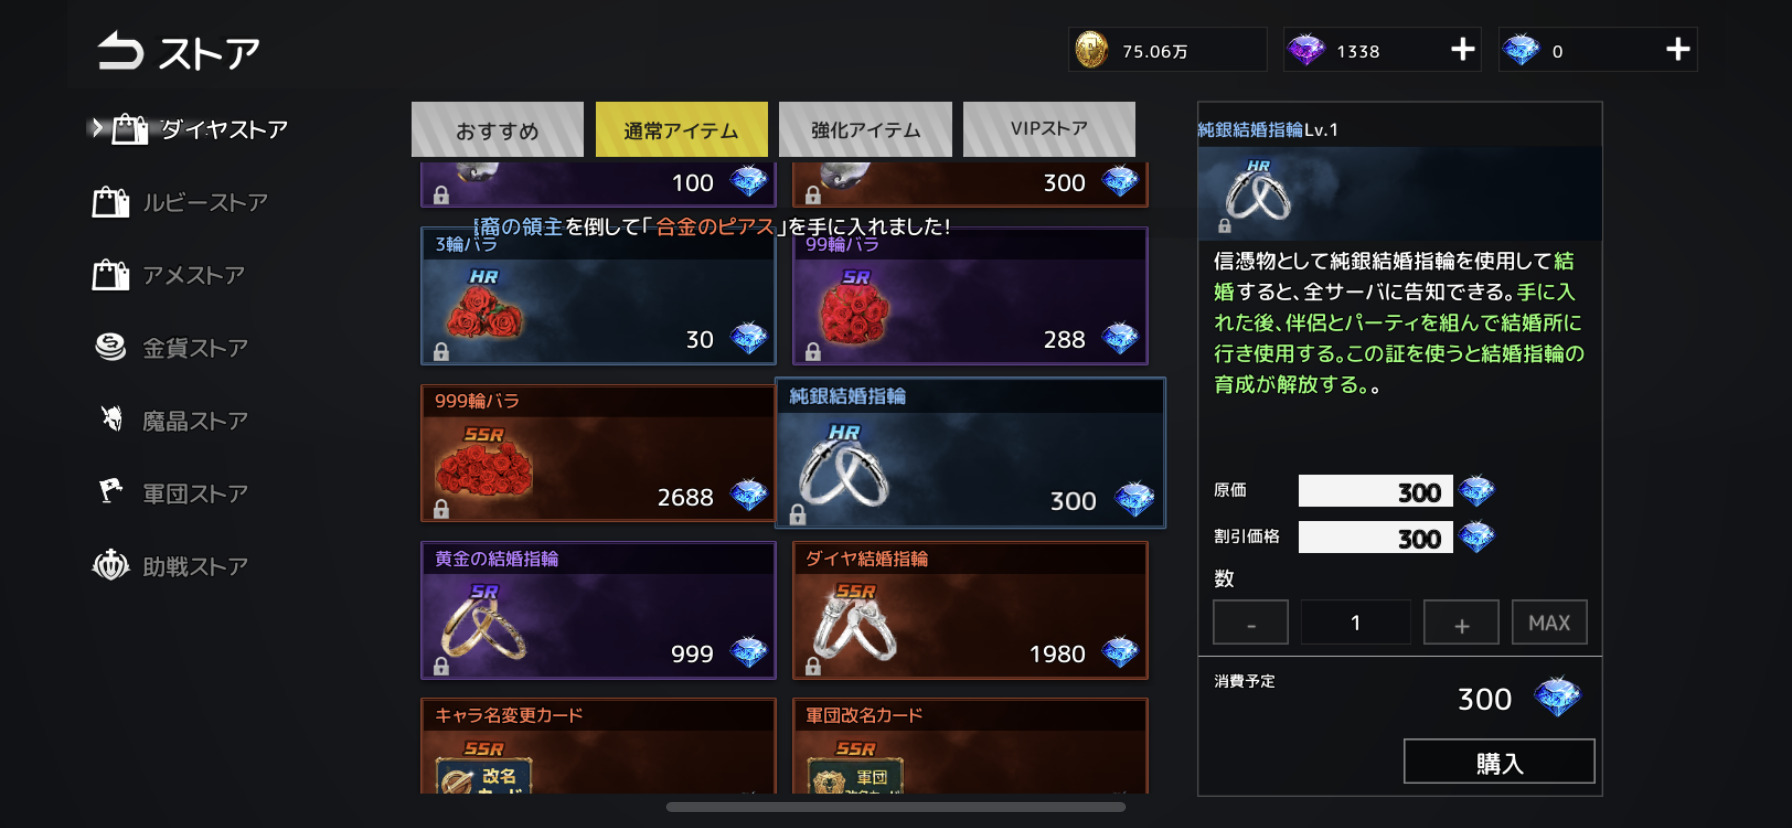 ARKA-蒼穹の門のゲーム画像